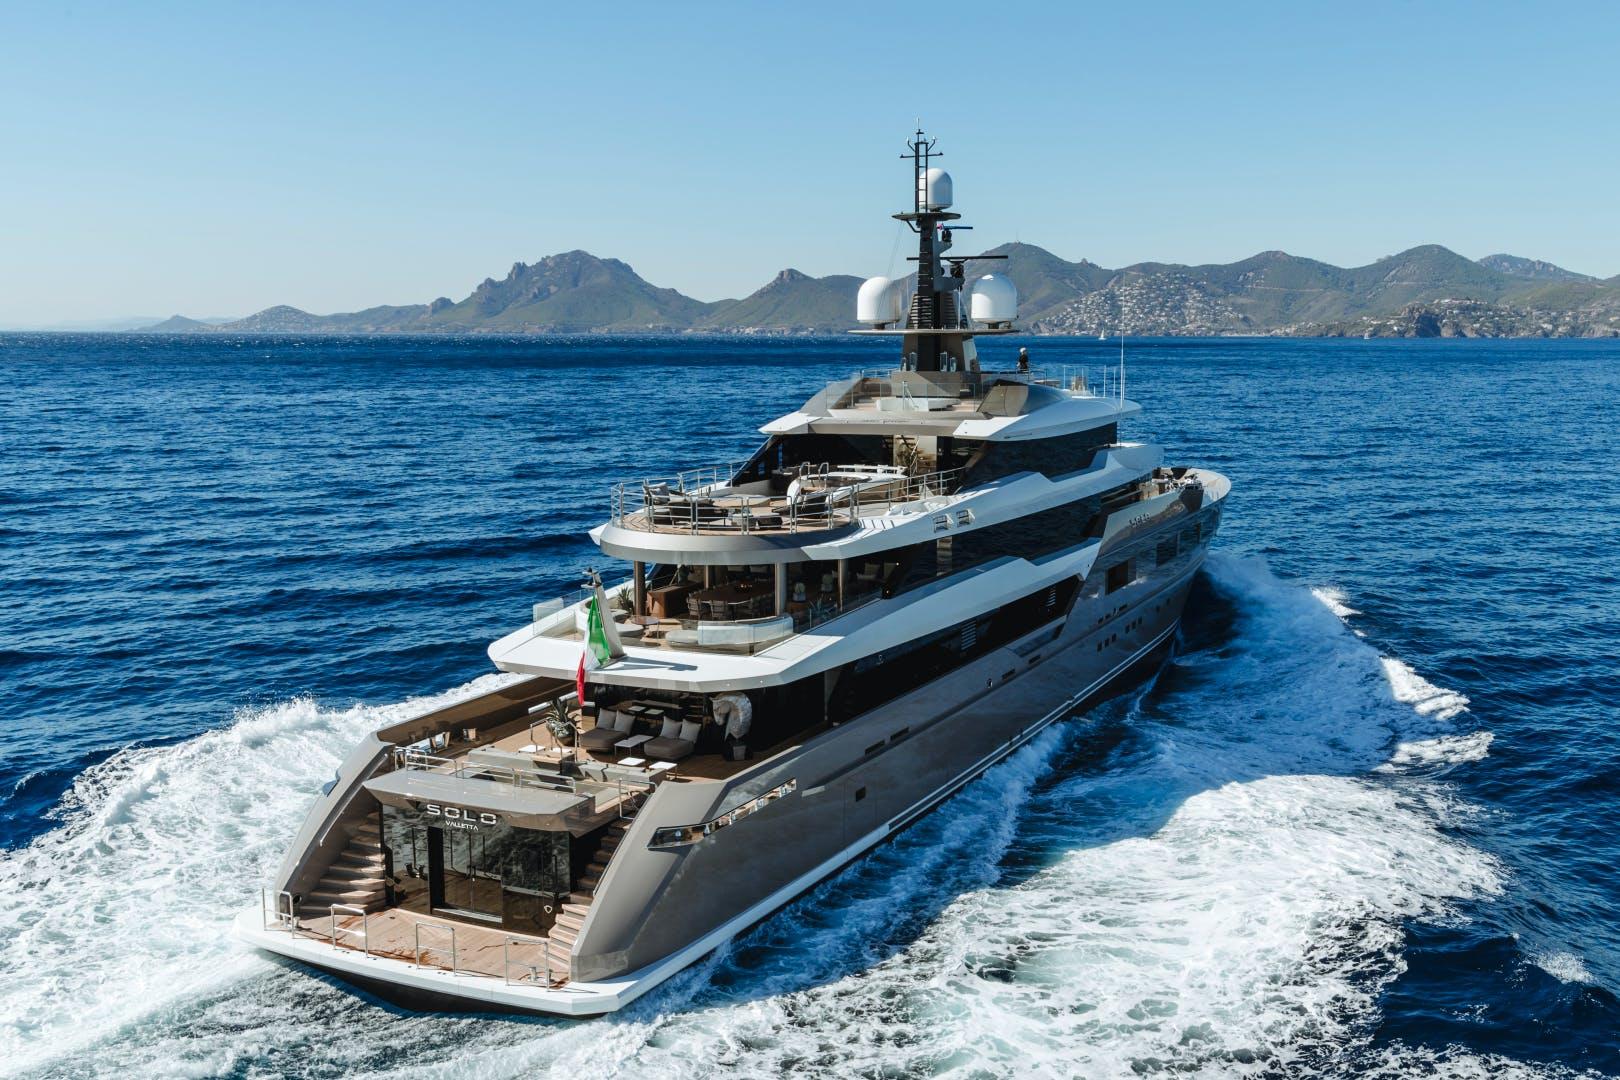 SOLO Yacht for Sale | 236 Tankoa 2018